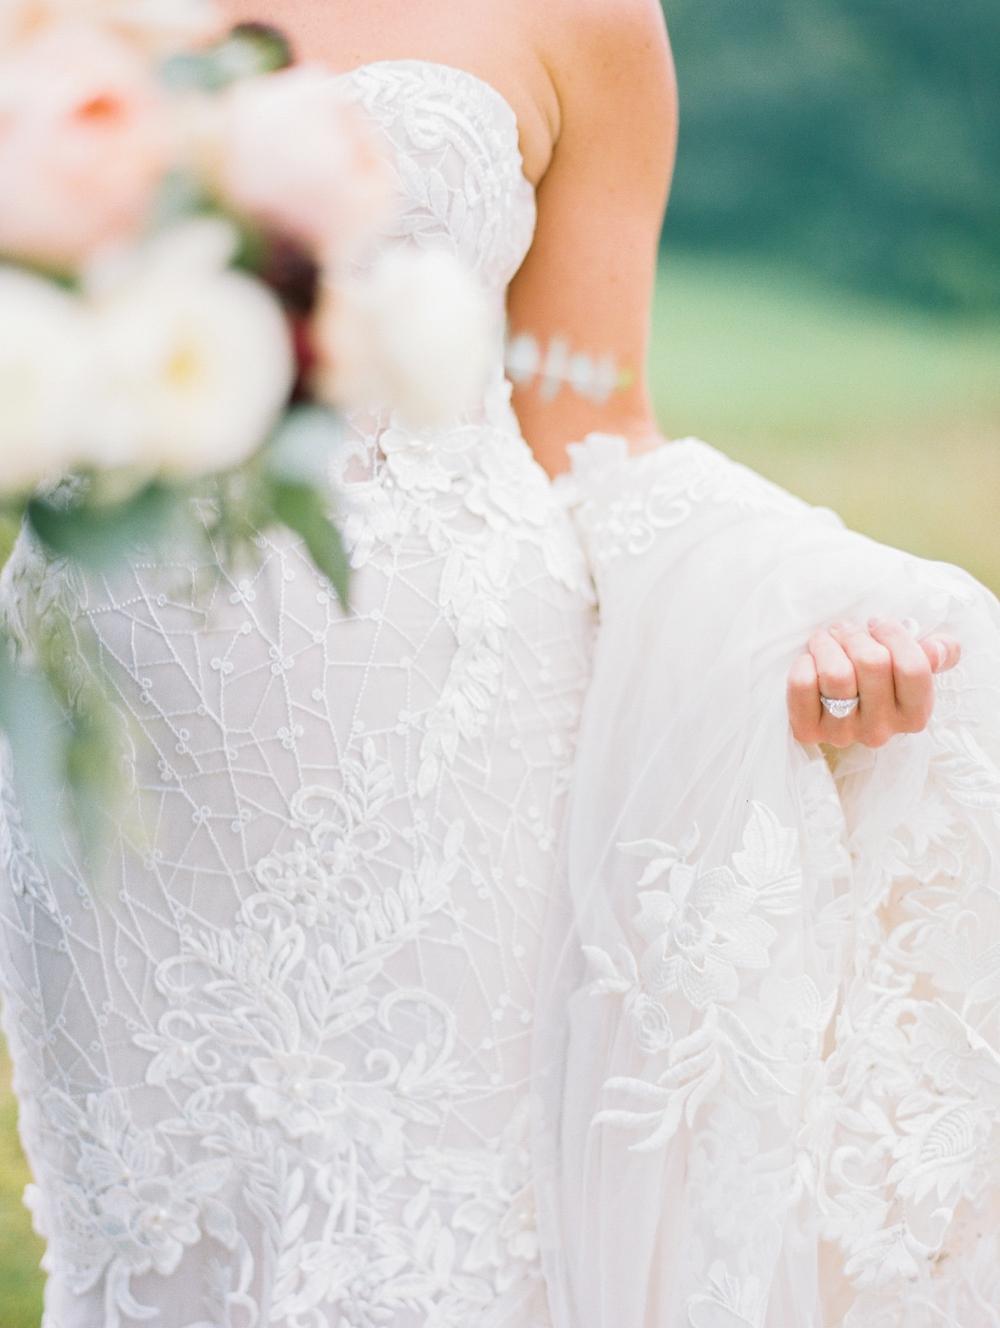 Kristin-La-Voie-Photography-CHICAGO-WEDDING-PHOTOGRAPHER-KOHLER-WHISTLING-STRAITS-149